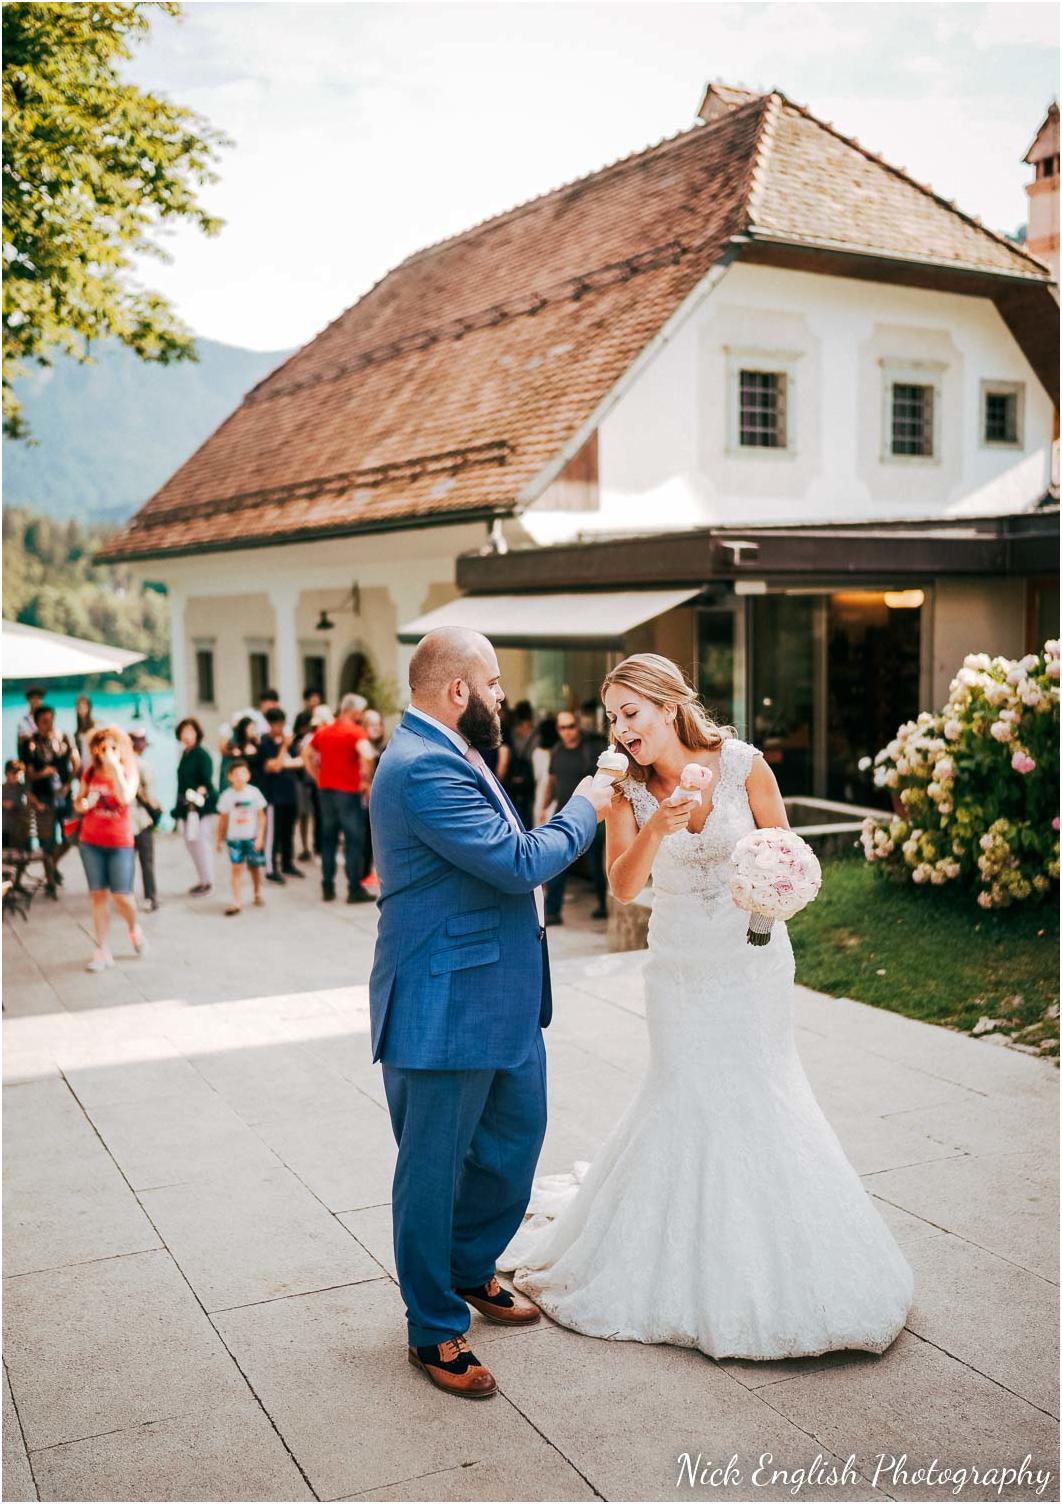 Destination_Wedding_Photographer_Slovenia_Nick_English_Photography-70-17.jpg